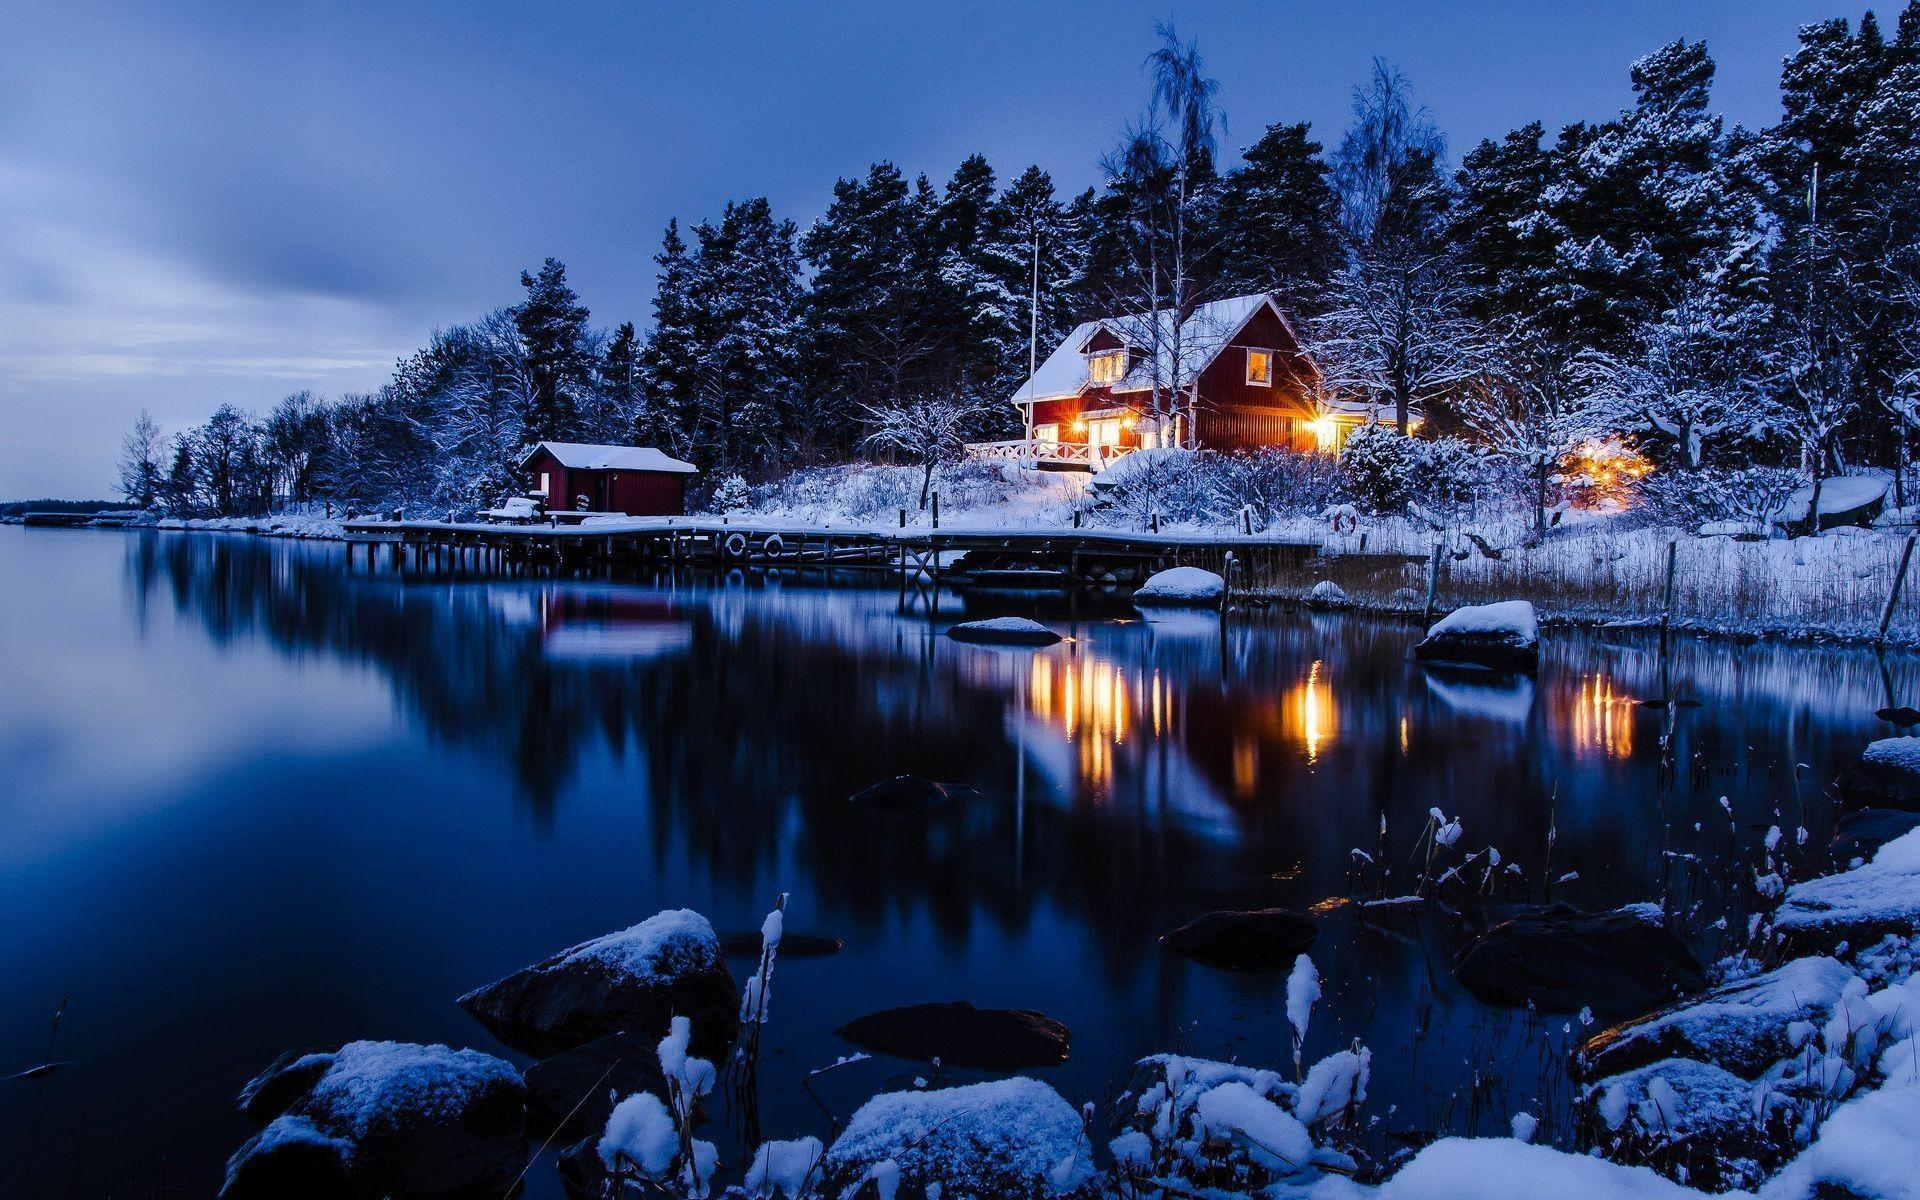 "1600x900 Winter Snow Desktop Wallpaper HD 49817 - Dongxue Series - Landscape ..."">"